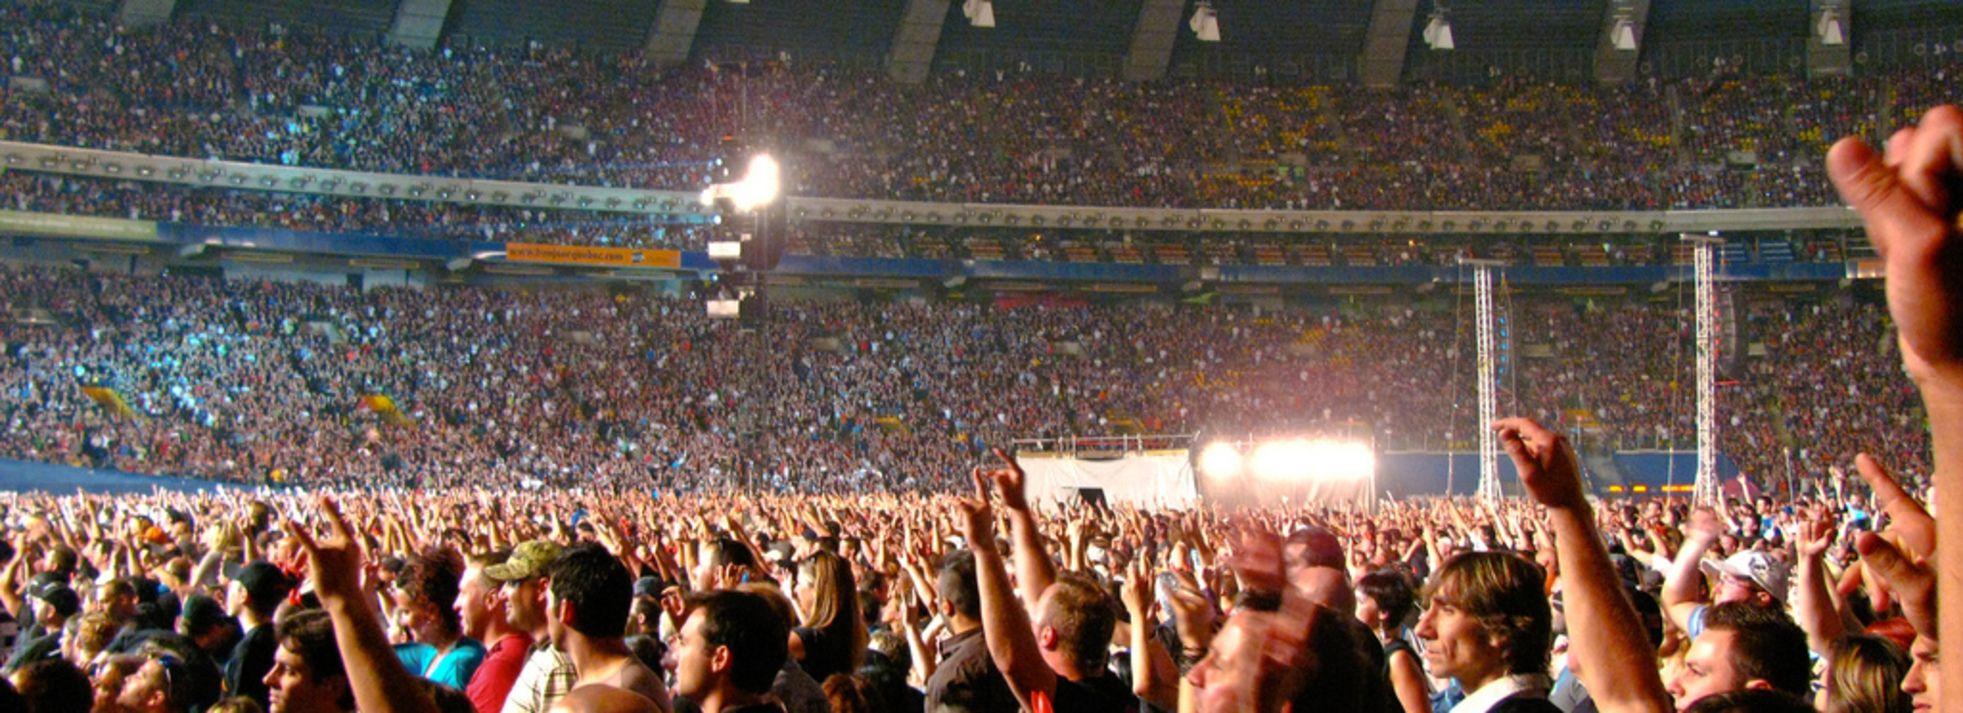 29 Wonderful Concerts In Montreal Next Month Concert Rainbow Kitten Surprise Montreal